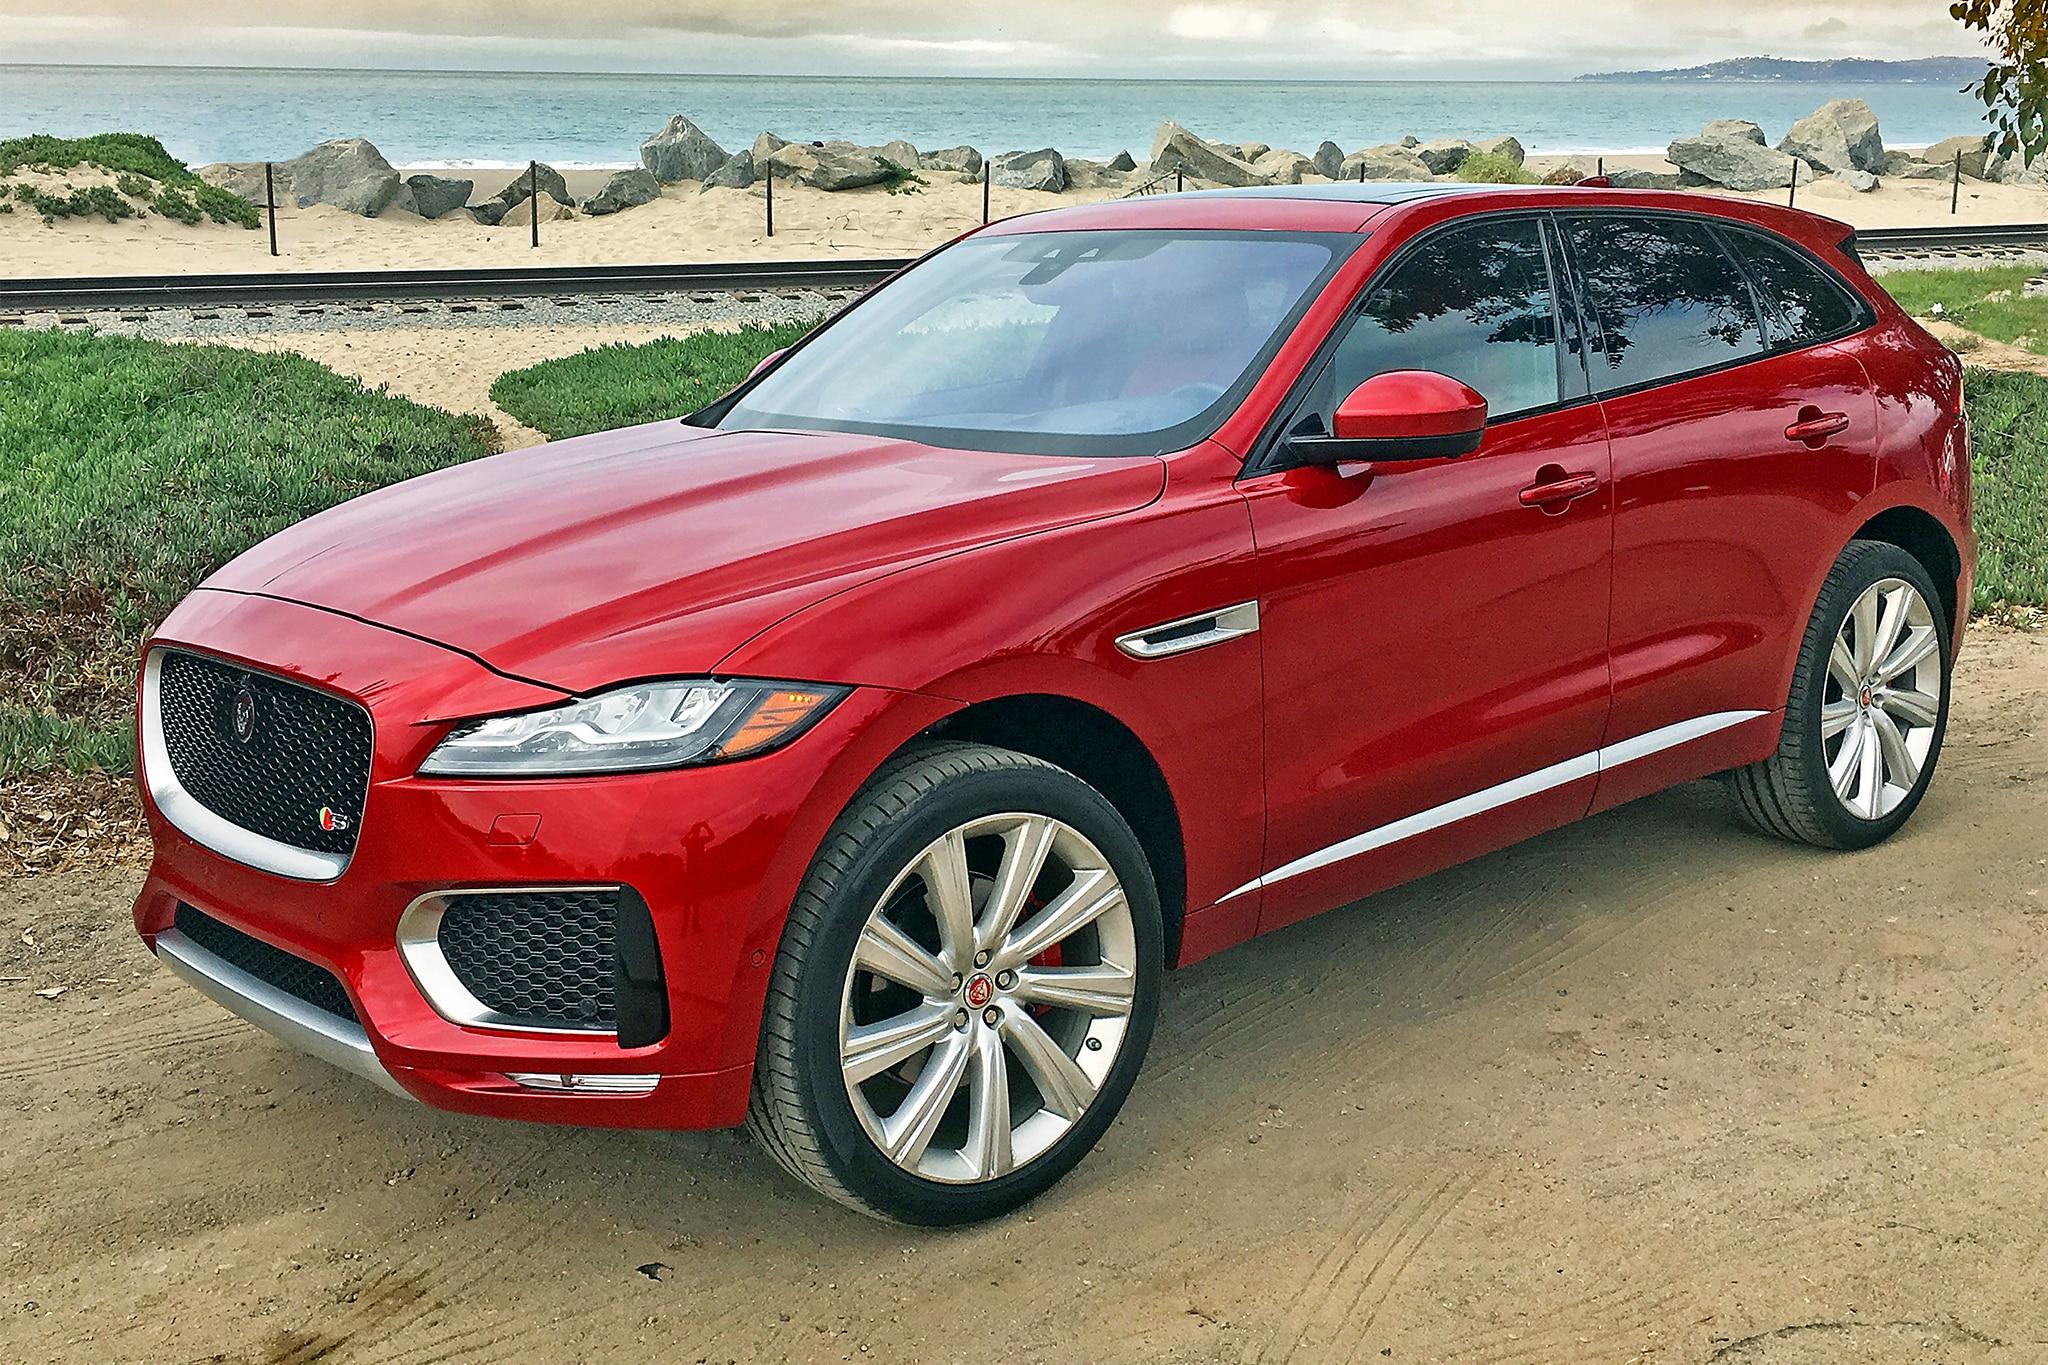 2017 jaguar f pace s one week review automobile magazine. Black Bedroom Furniture Sets. Home Design Ideas